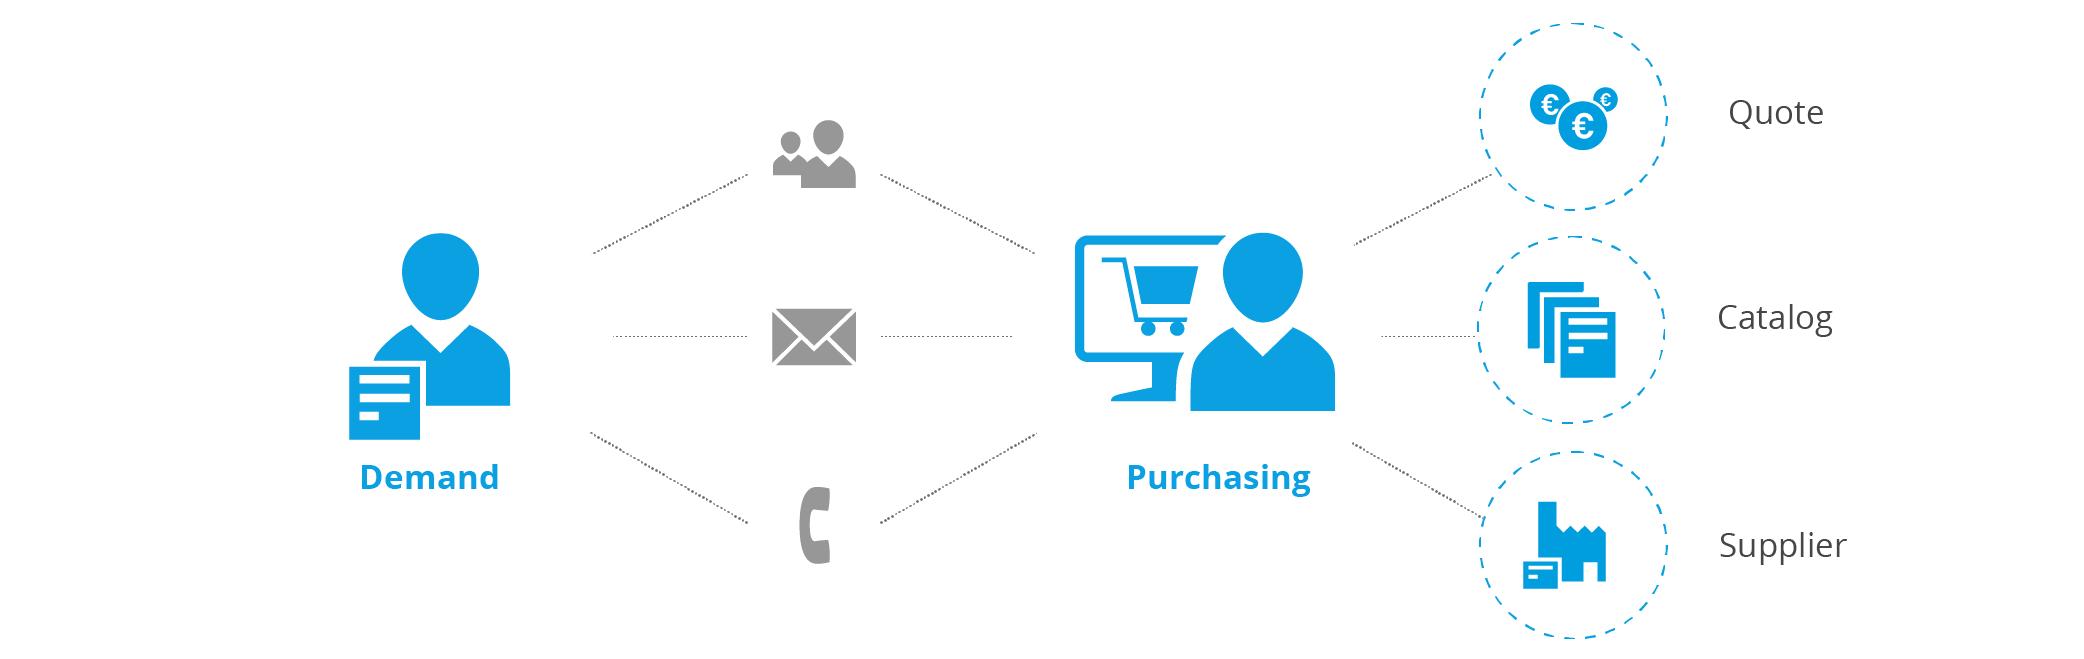 Procurement process - Demand - Purchasing